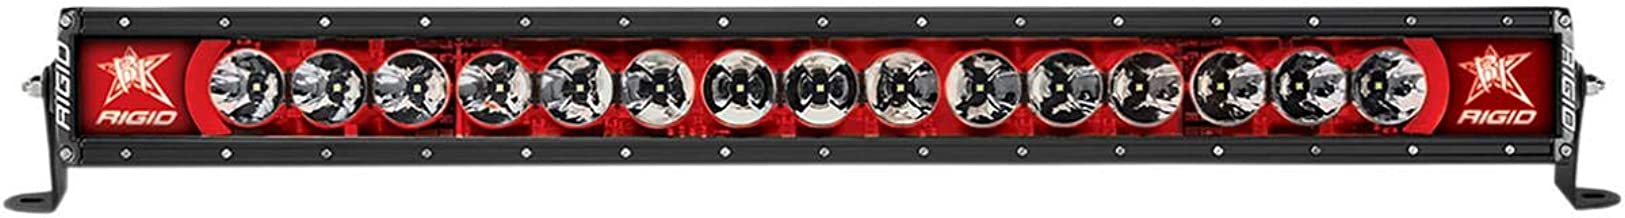 Rigid Industries 230023 Radiance+, 30 Inch, Red Backlight, LED Light Bar Universal